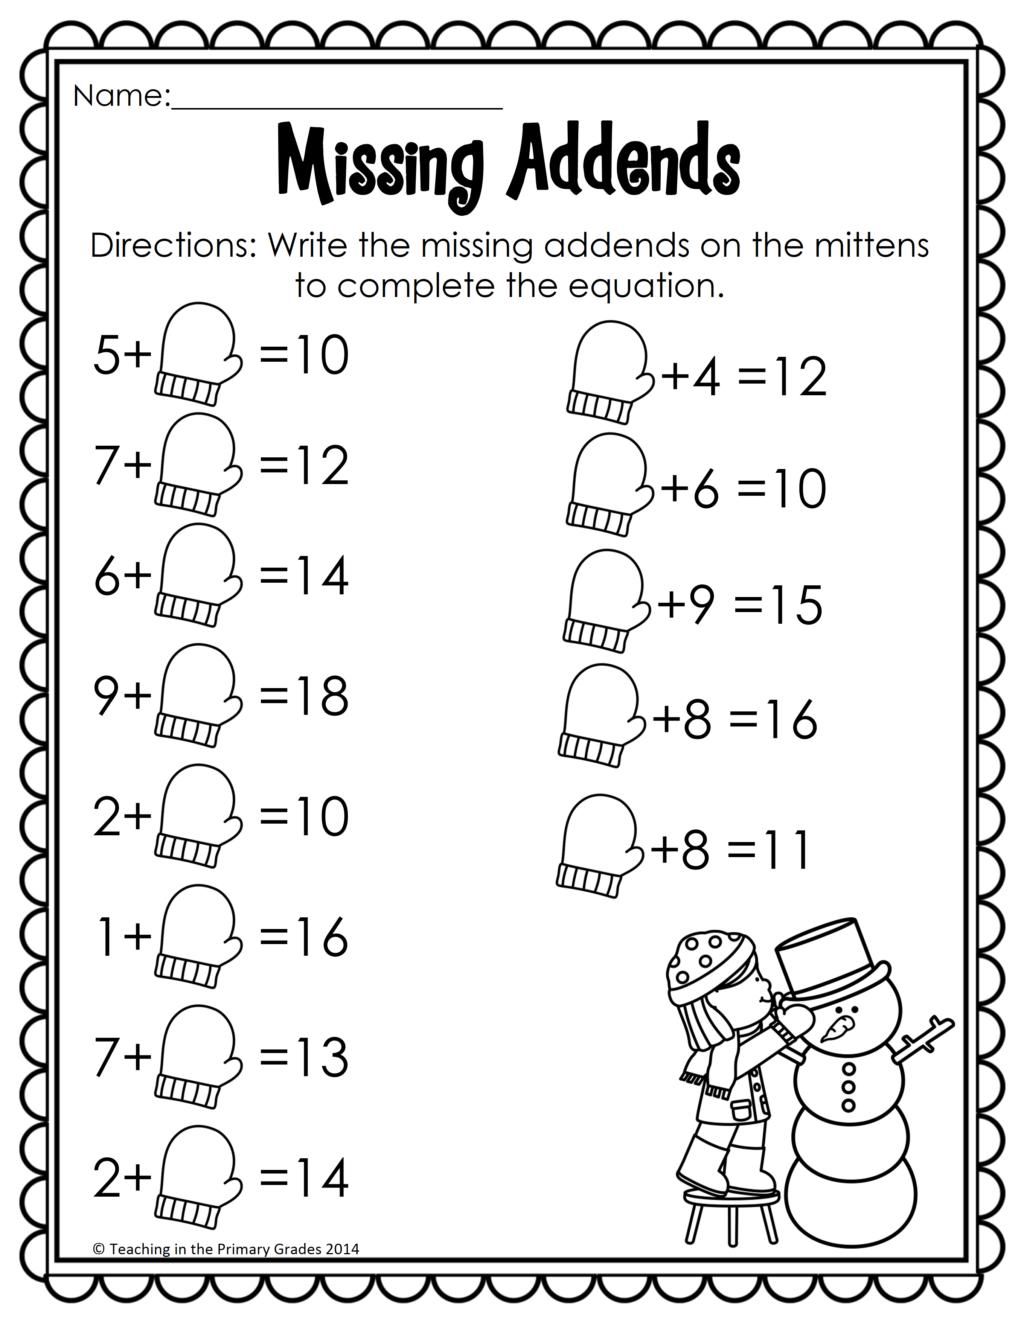 Worksheet ~ Winter Math And Literacy Printables No Prep 1St